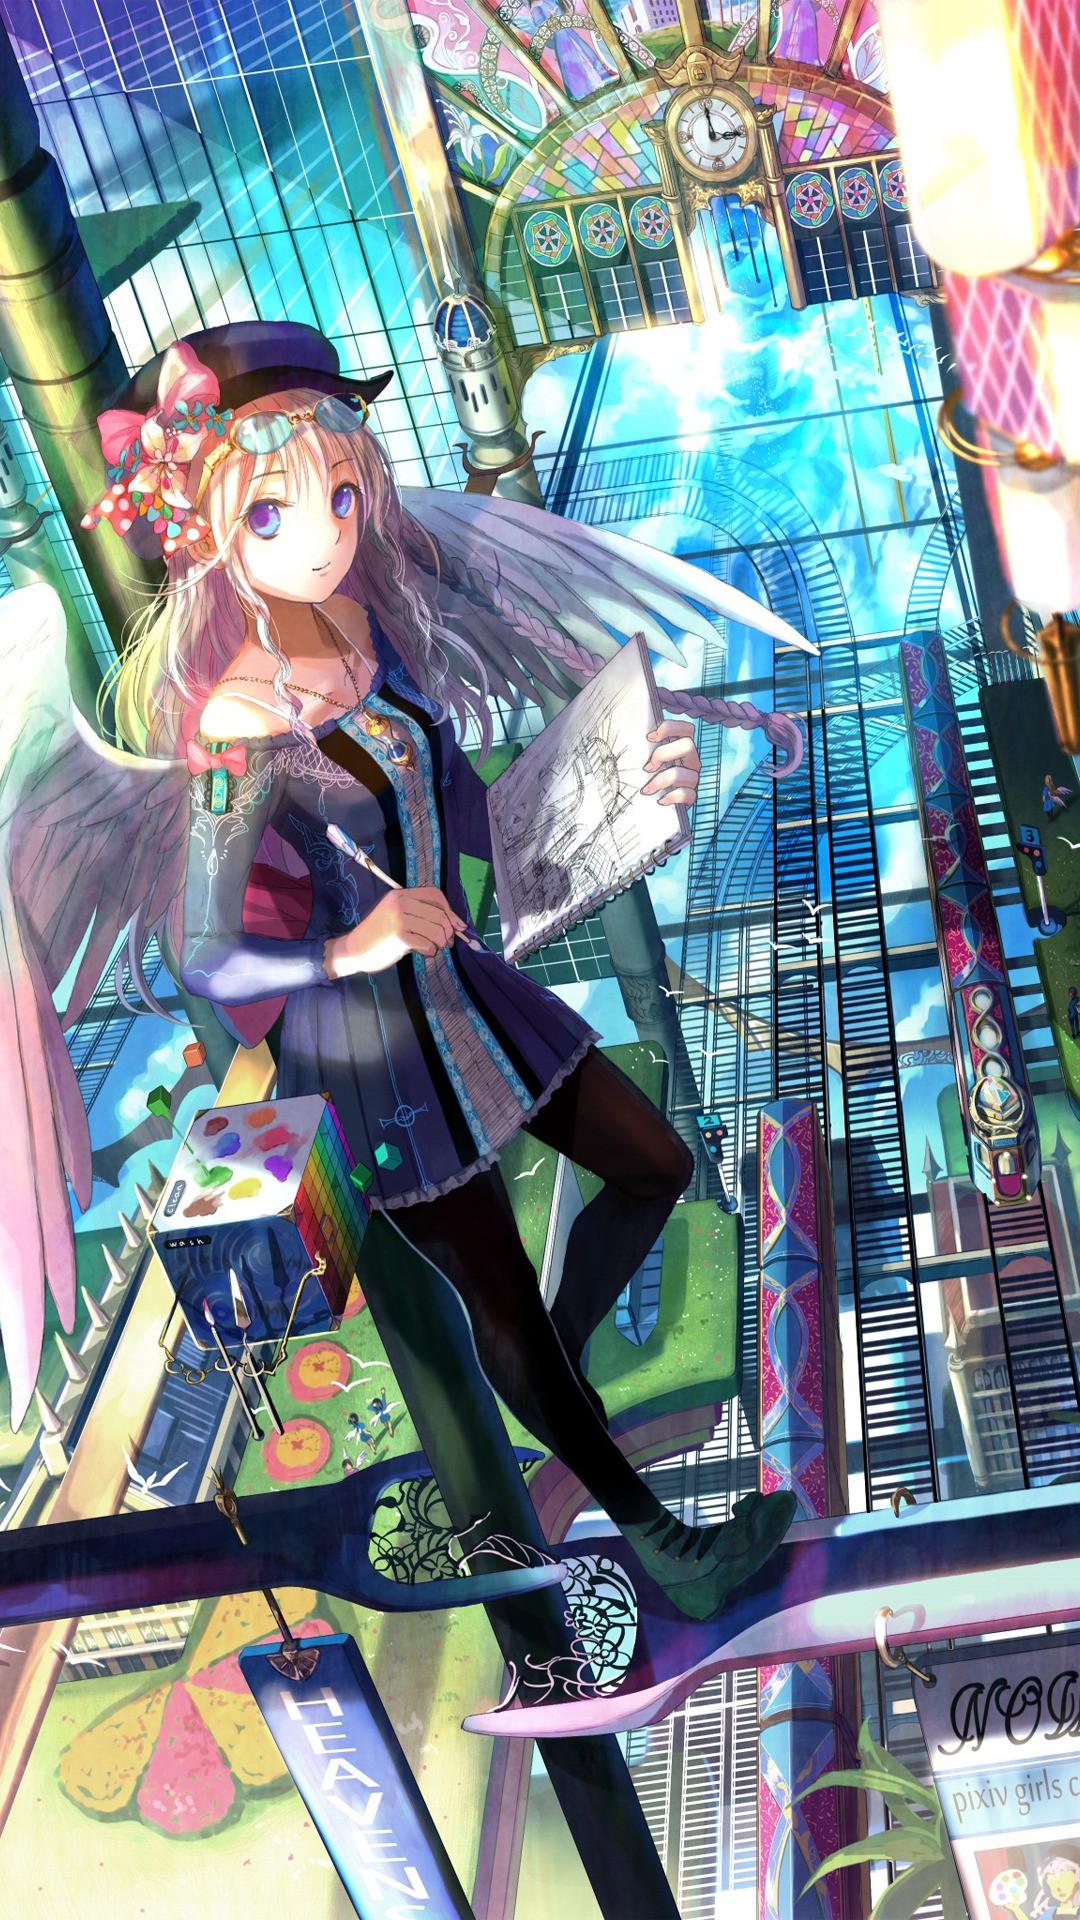 Anime • 83 downloads Vagabond · Painter Anime mobile wallpaper